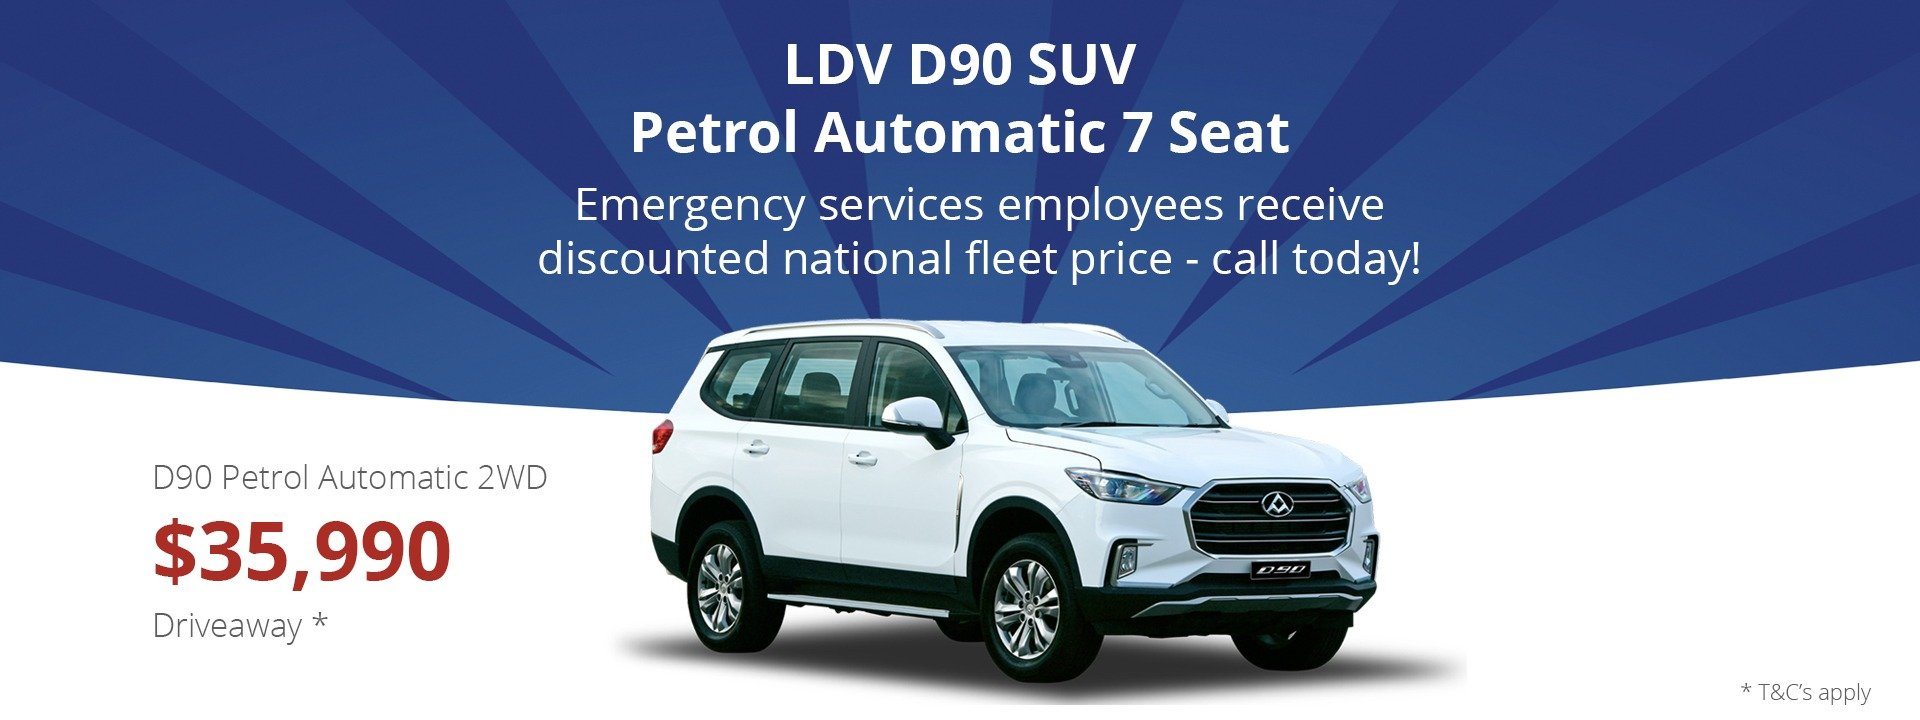 Carwise LDV D90 7 Seat